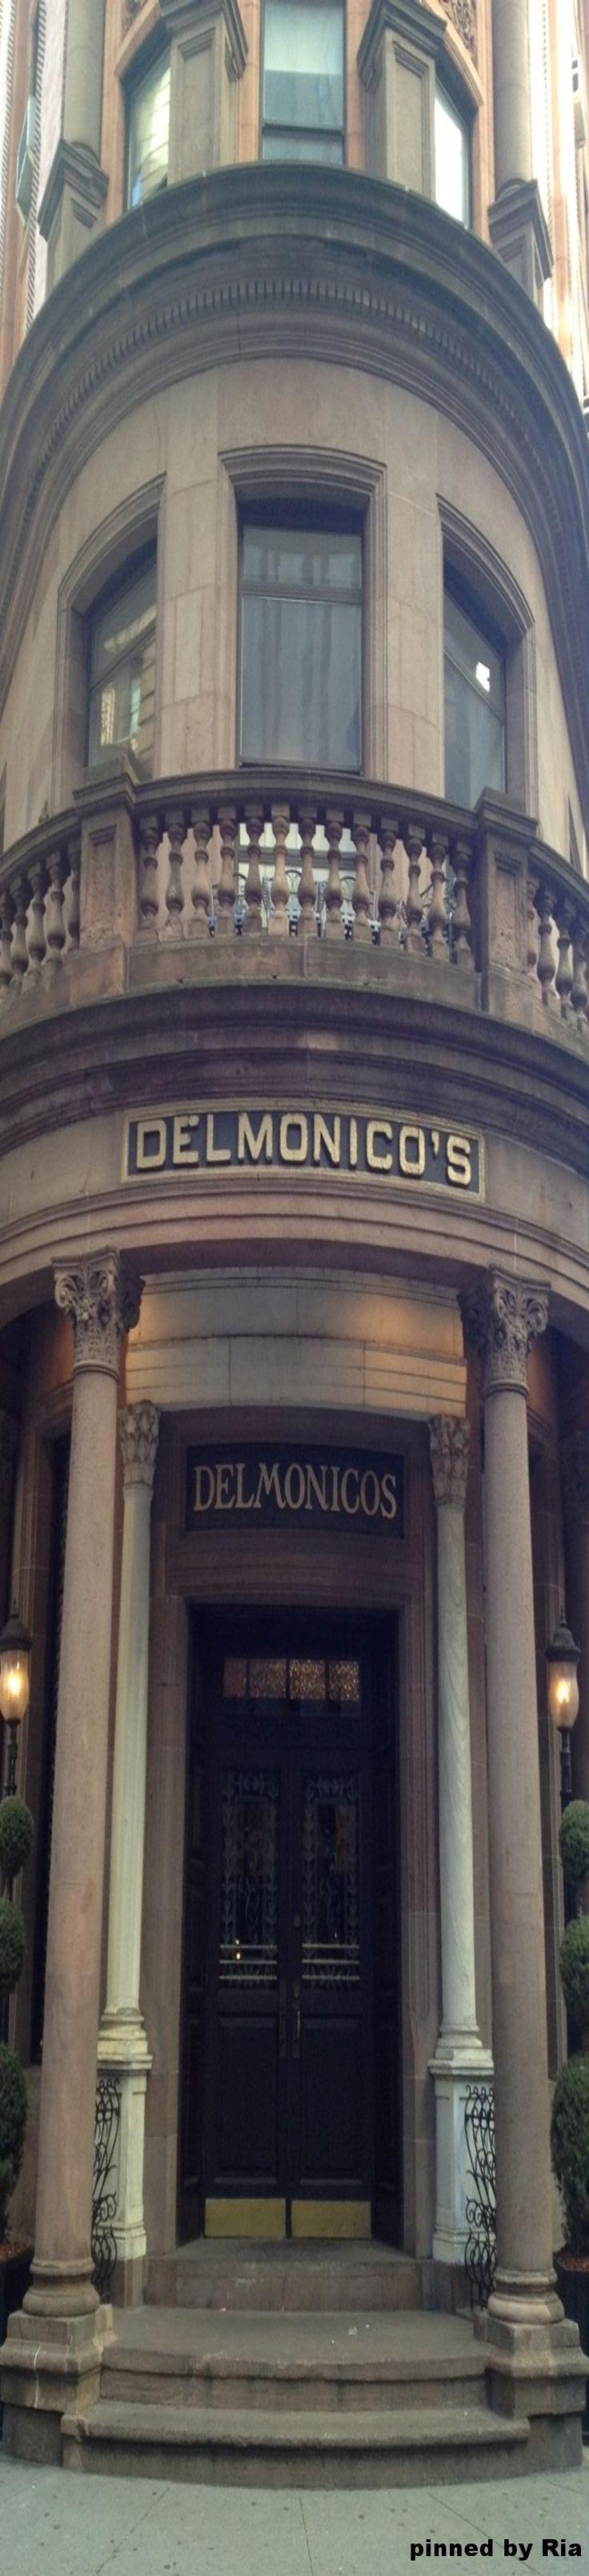 DELMONICO`S STEAKHOUSE , NEW YORK CITY, Est. 1837 l Ria